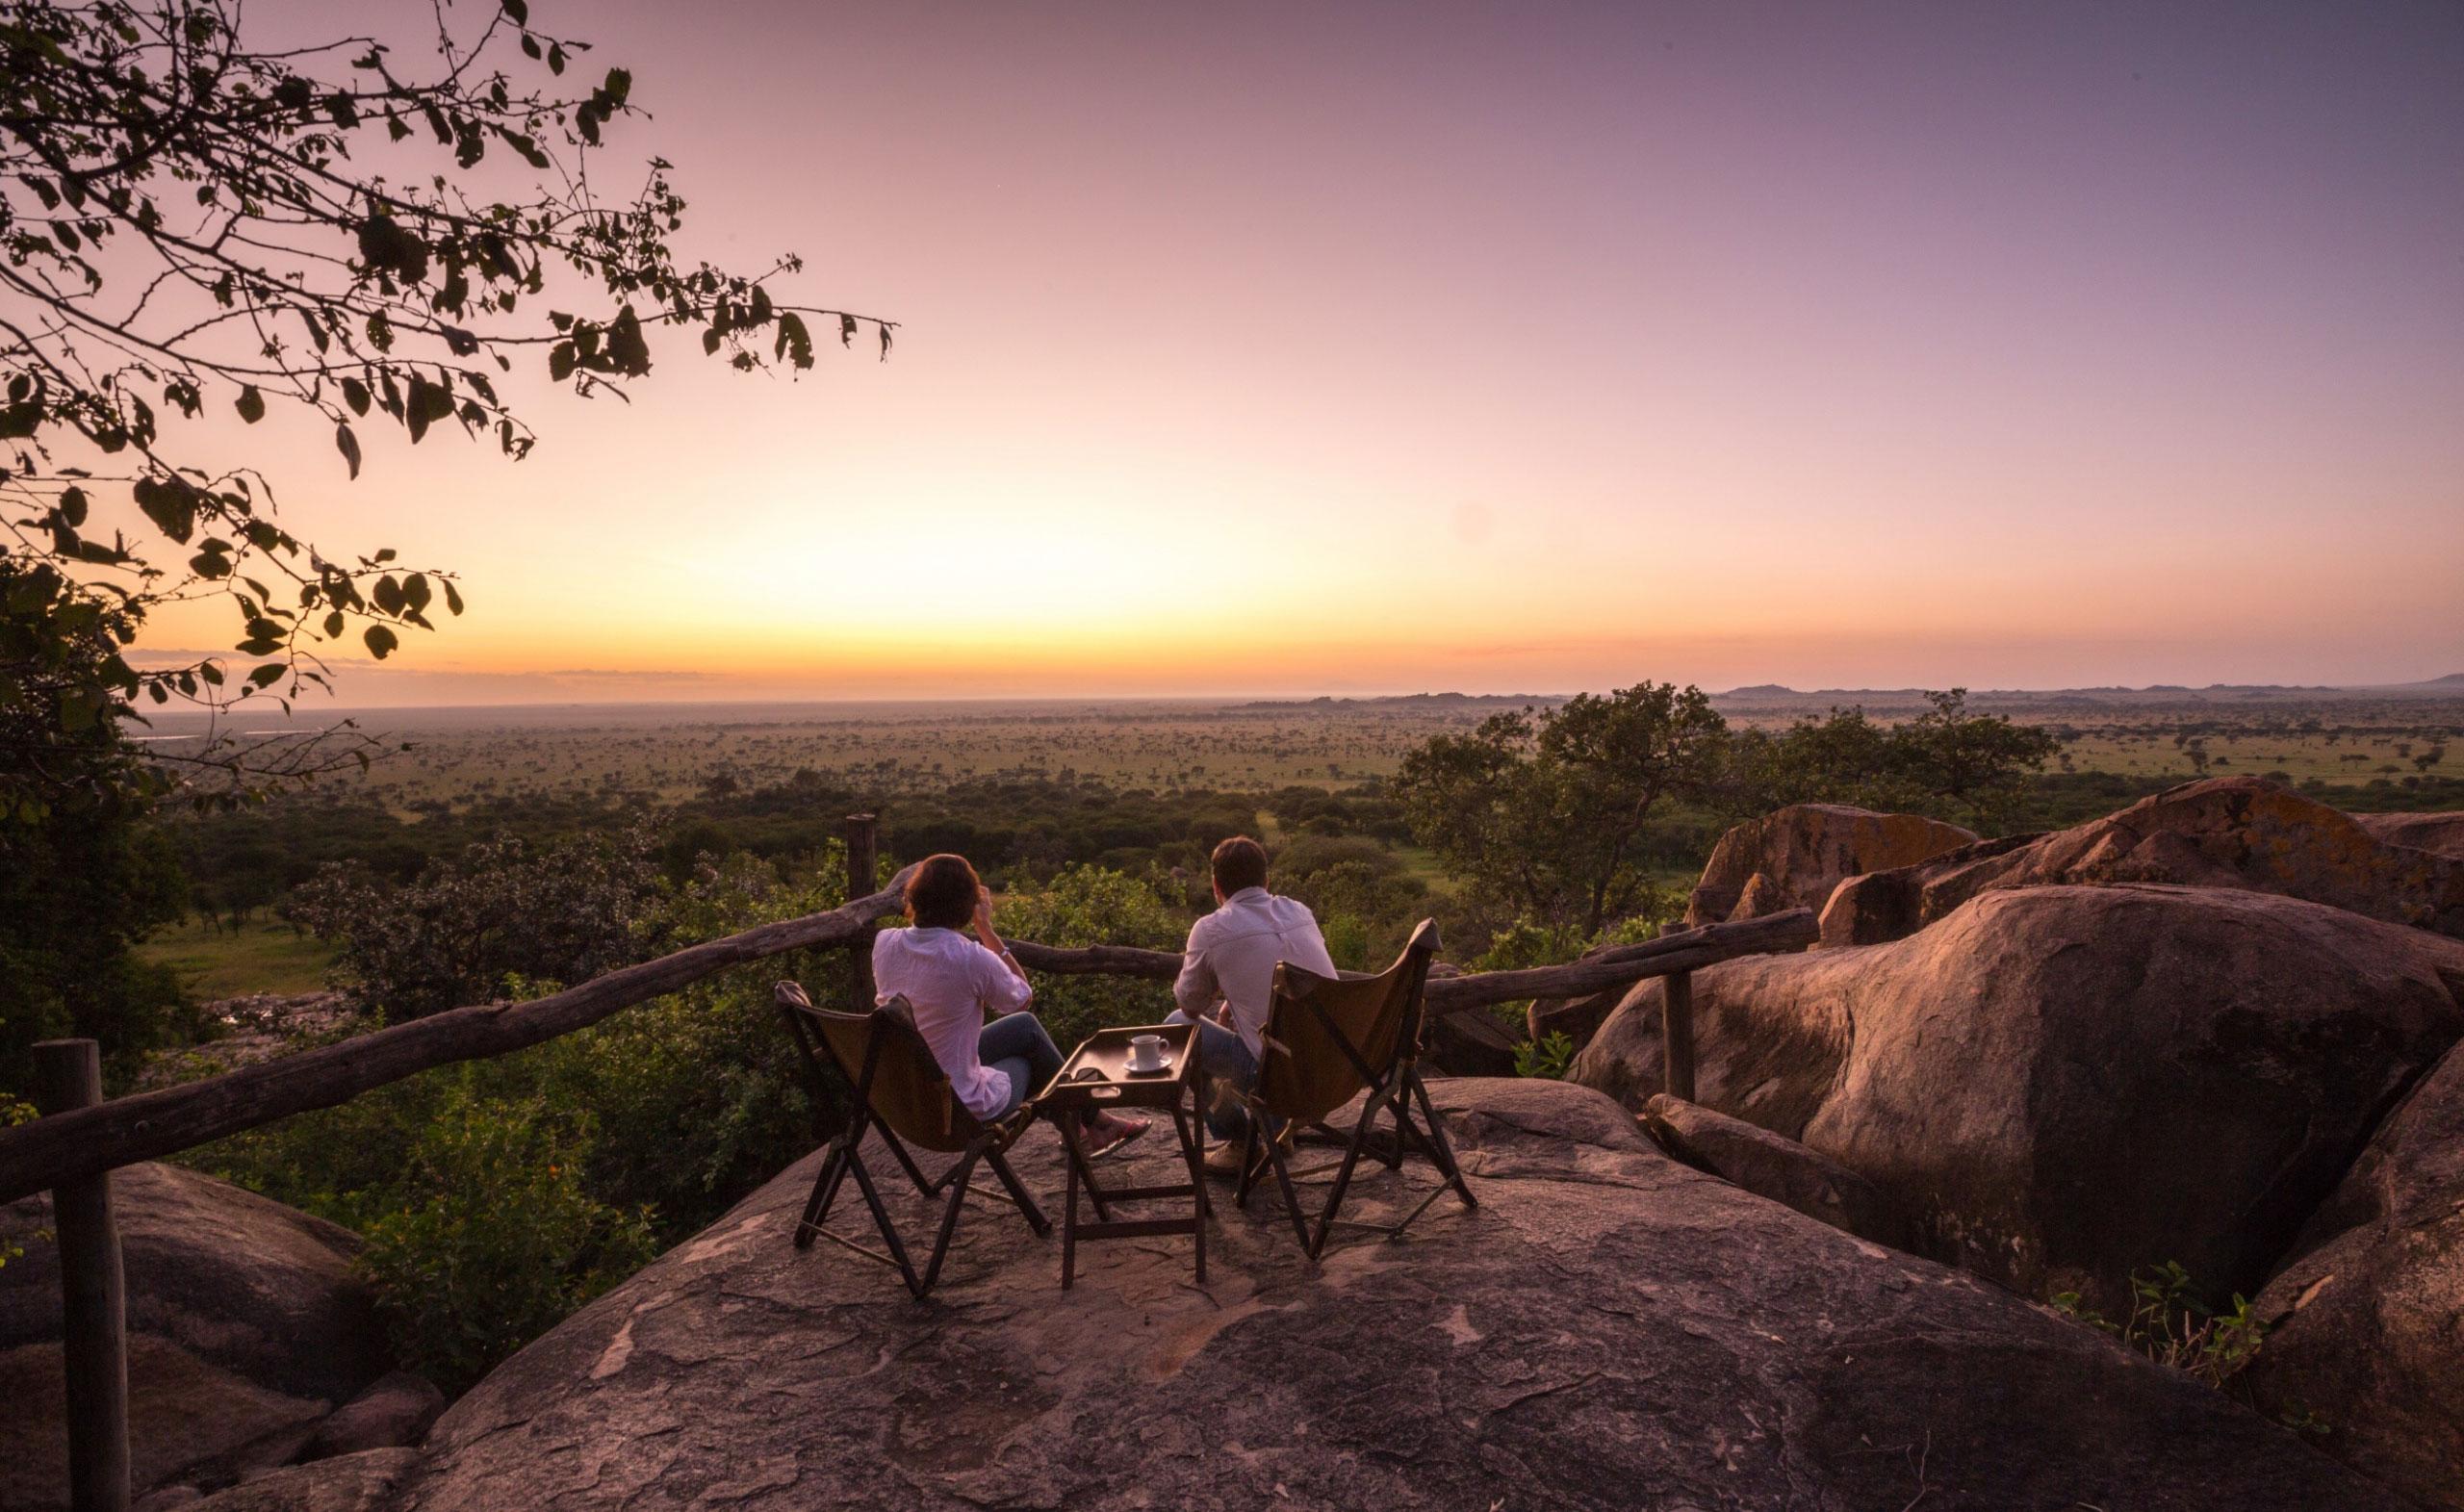 elewana serengeti pioneer camp view tanzania enkosi africa Campamento mejores Vistas África